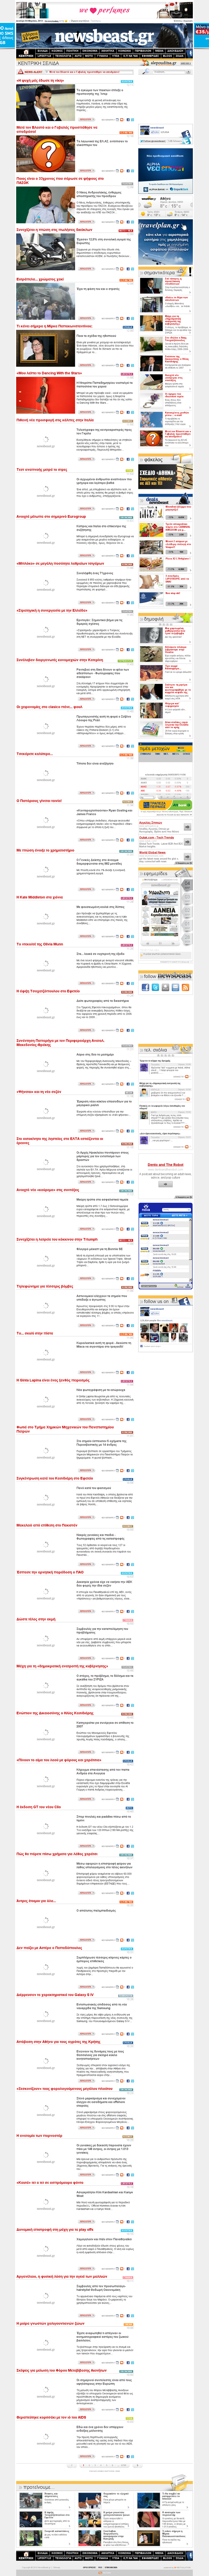 News Beast at Monday March 4, 2013, 10:13 a.m. UTC